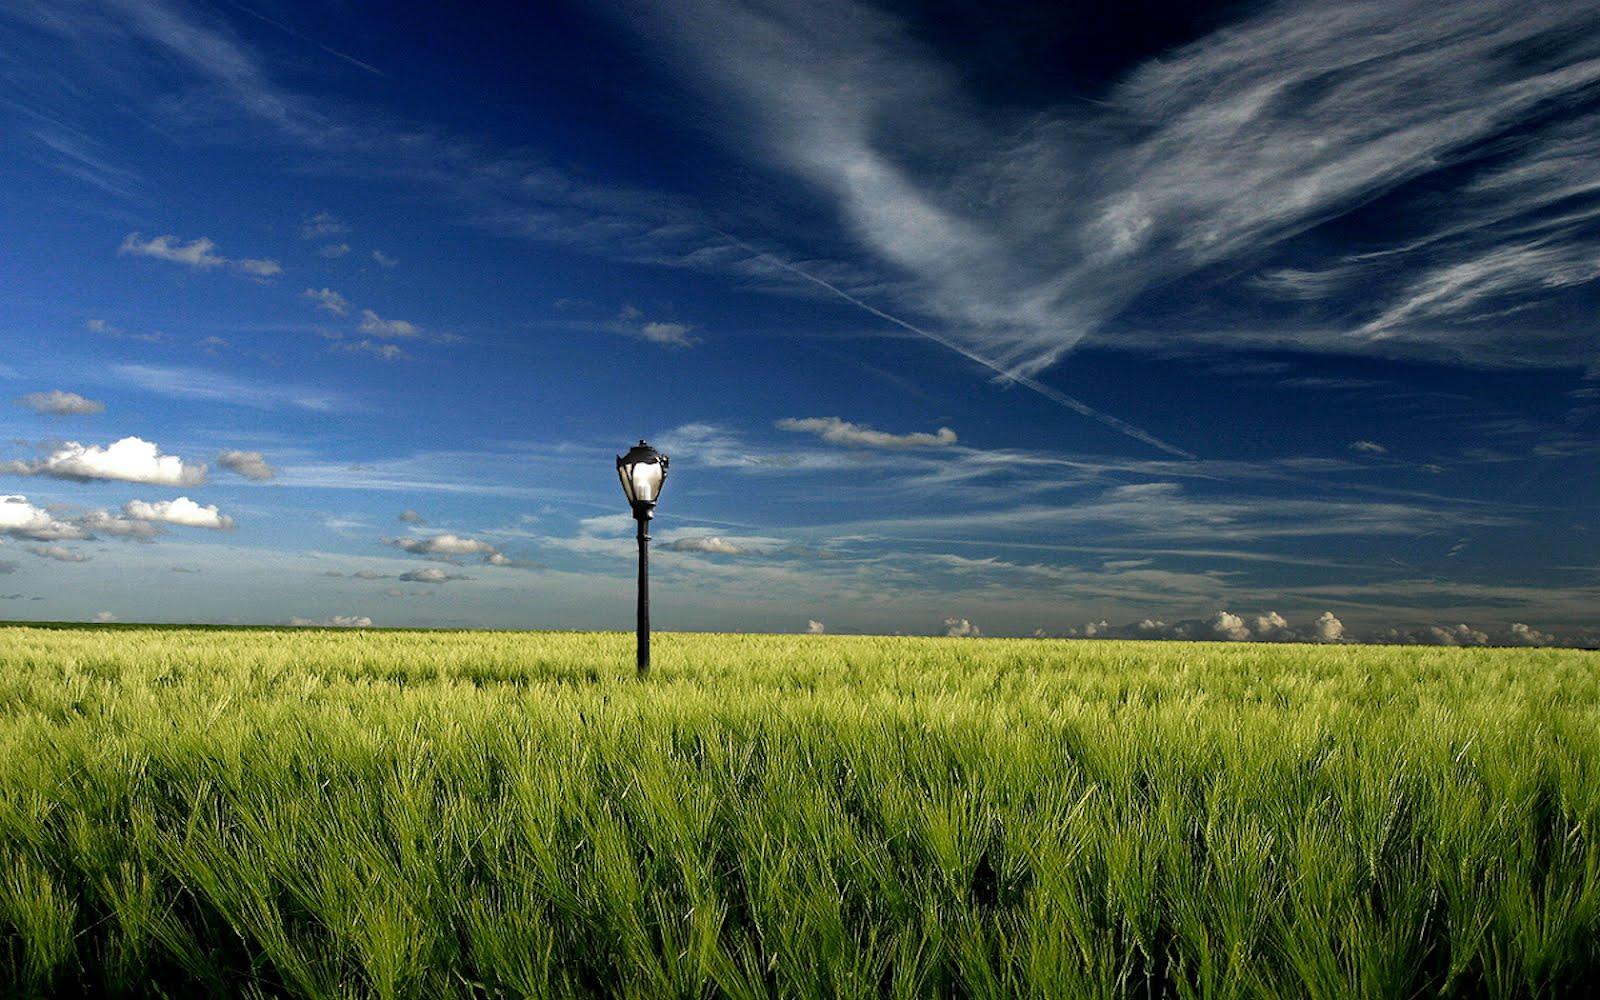 http://2.bp.blogspot.com/-PnaRZm9afXo/T0d5U0Px-wI/AAAAAAAAH4s/424LYL6celo/s1600/amazing-place-world-wallpaper.jpg